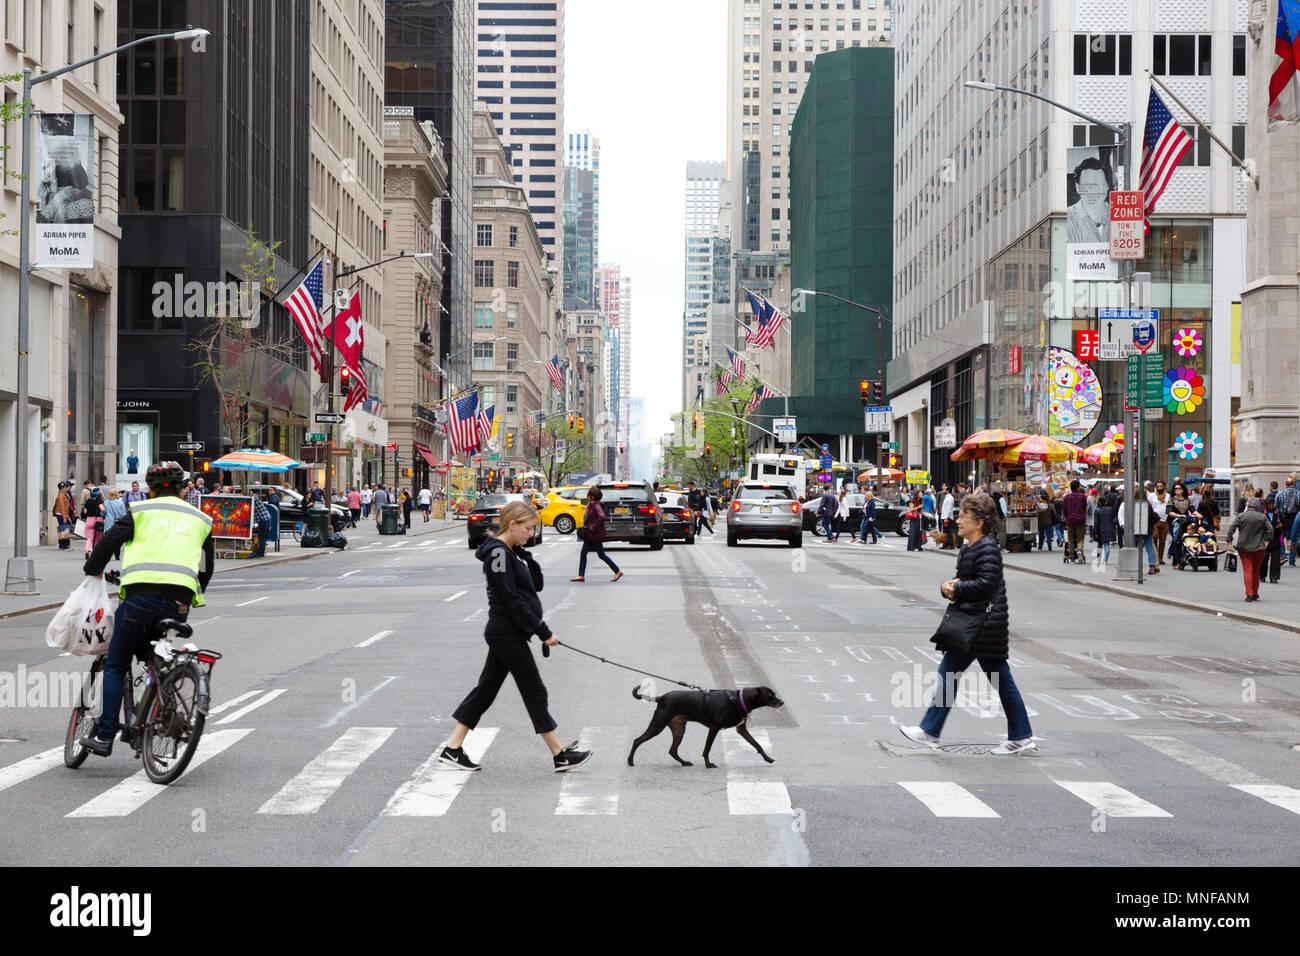 Fifth Avenue New York - pedestrians, walking the dog and cyclist crossing 5th Avenue, New york city, USA Stock Photo